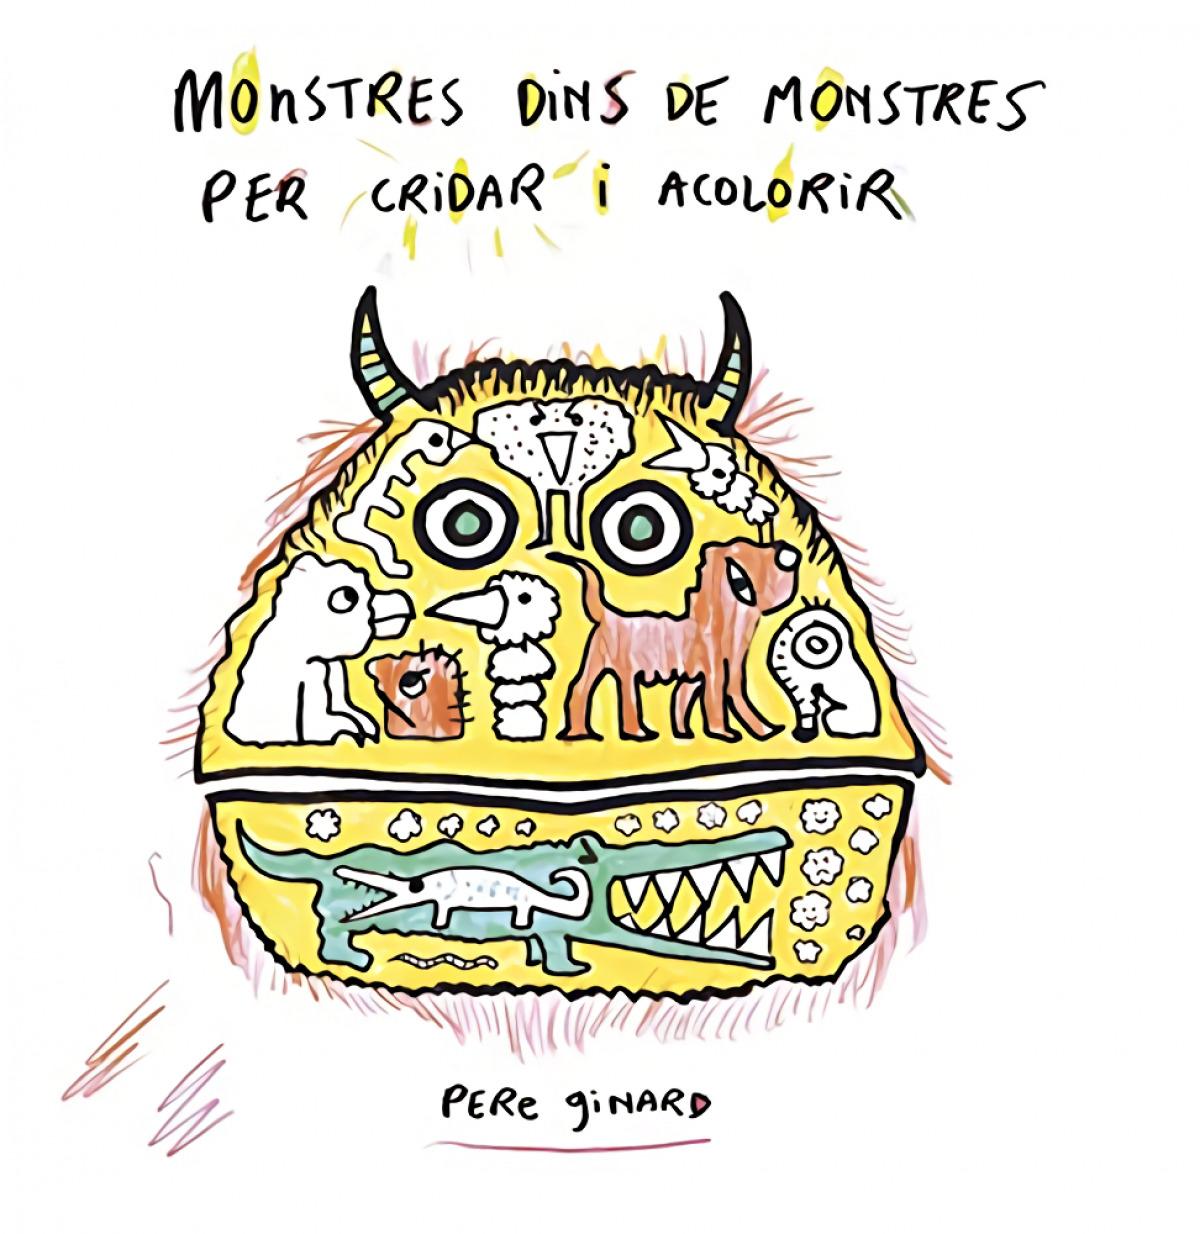 Monstres dins de monstres